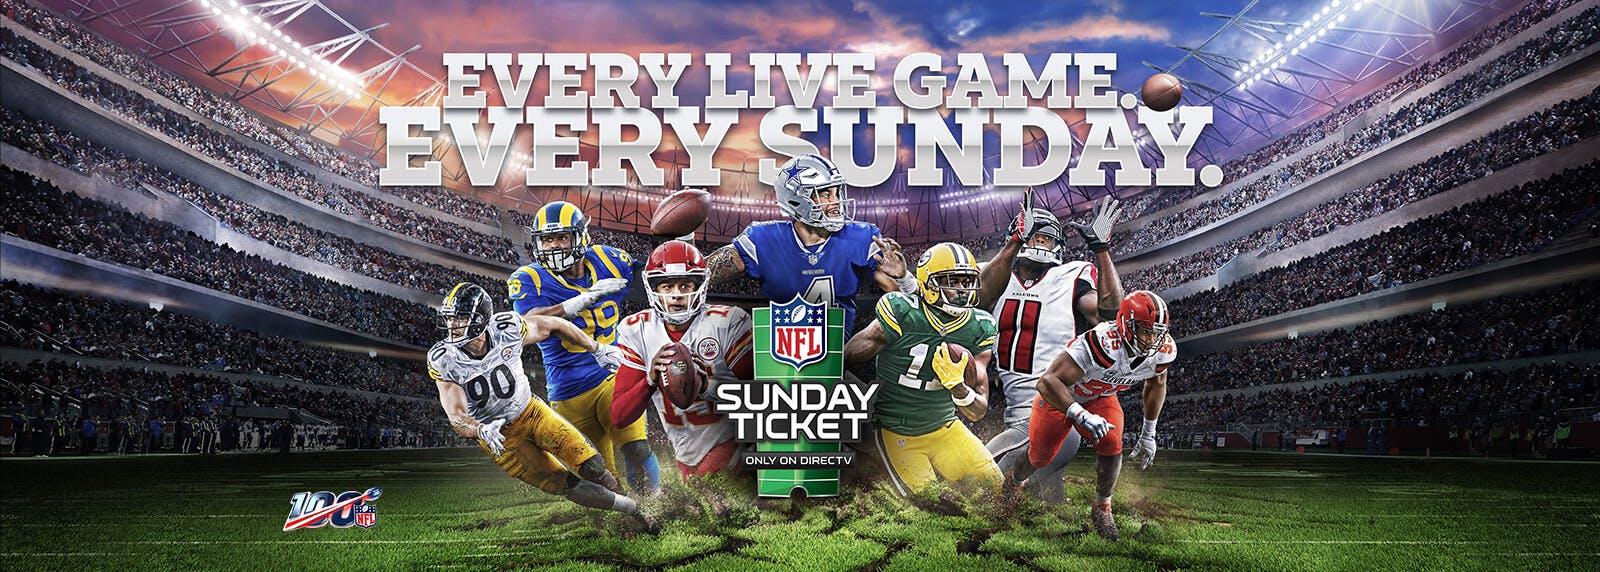 saints 49ers nfl sunday ticket streaming